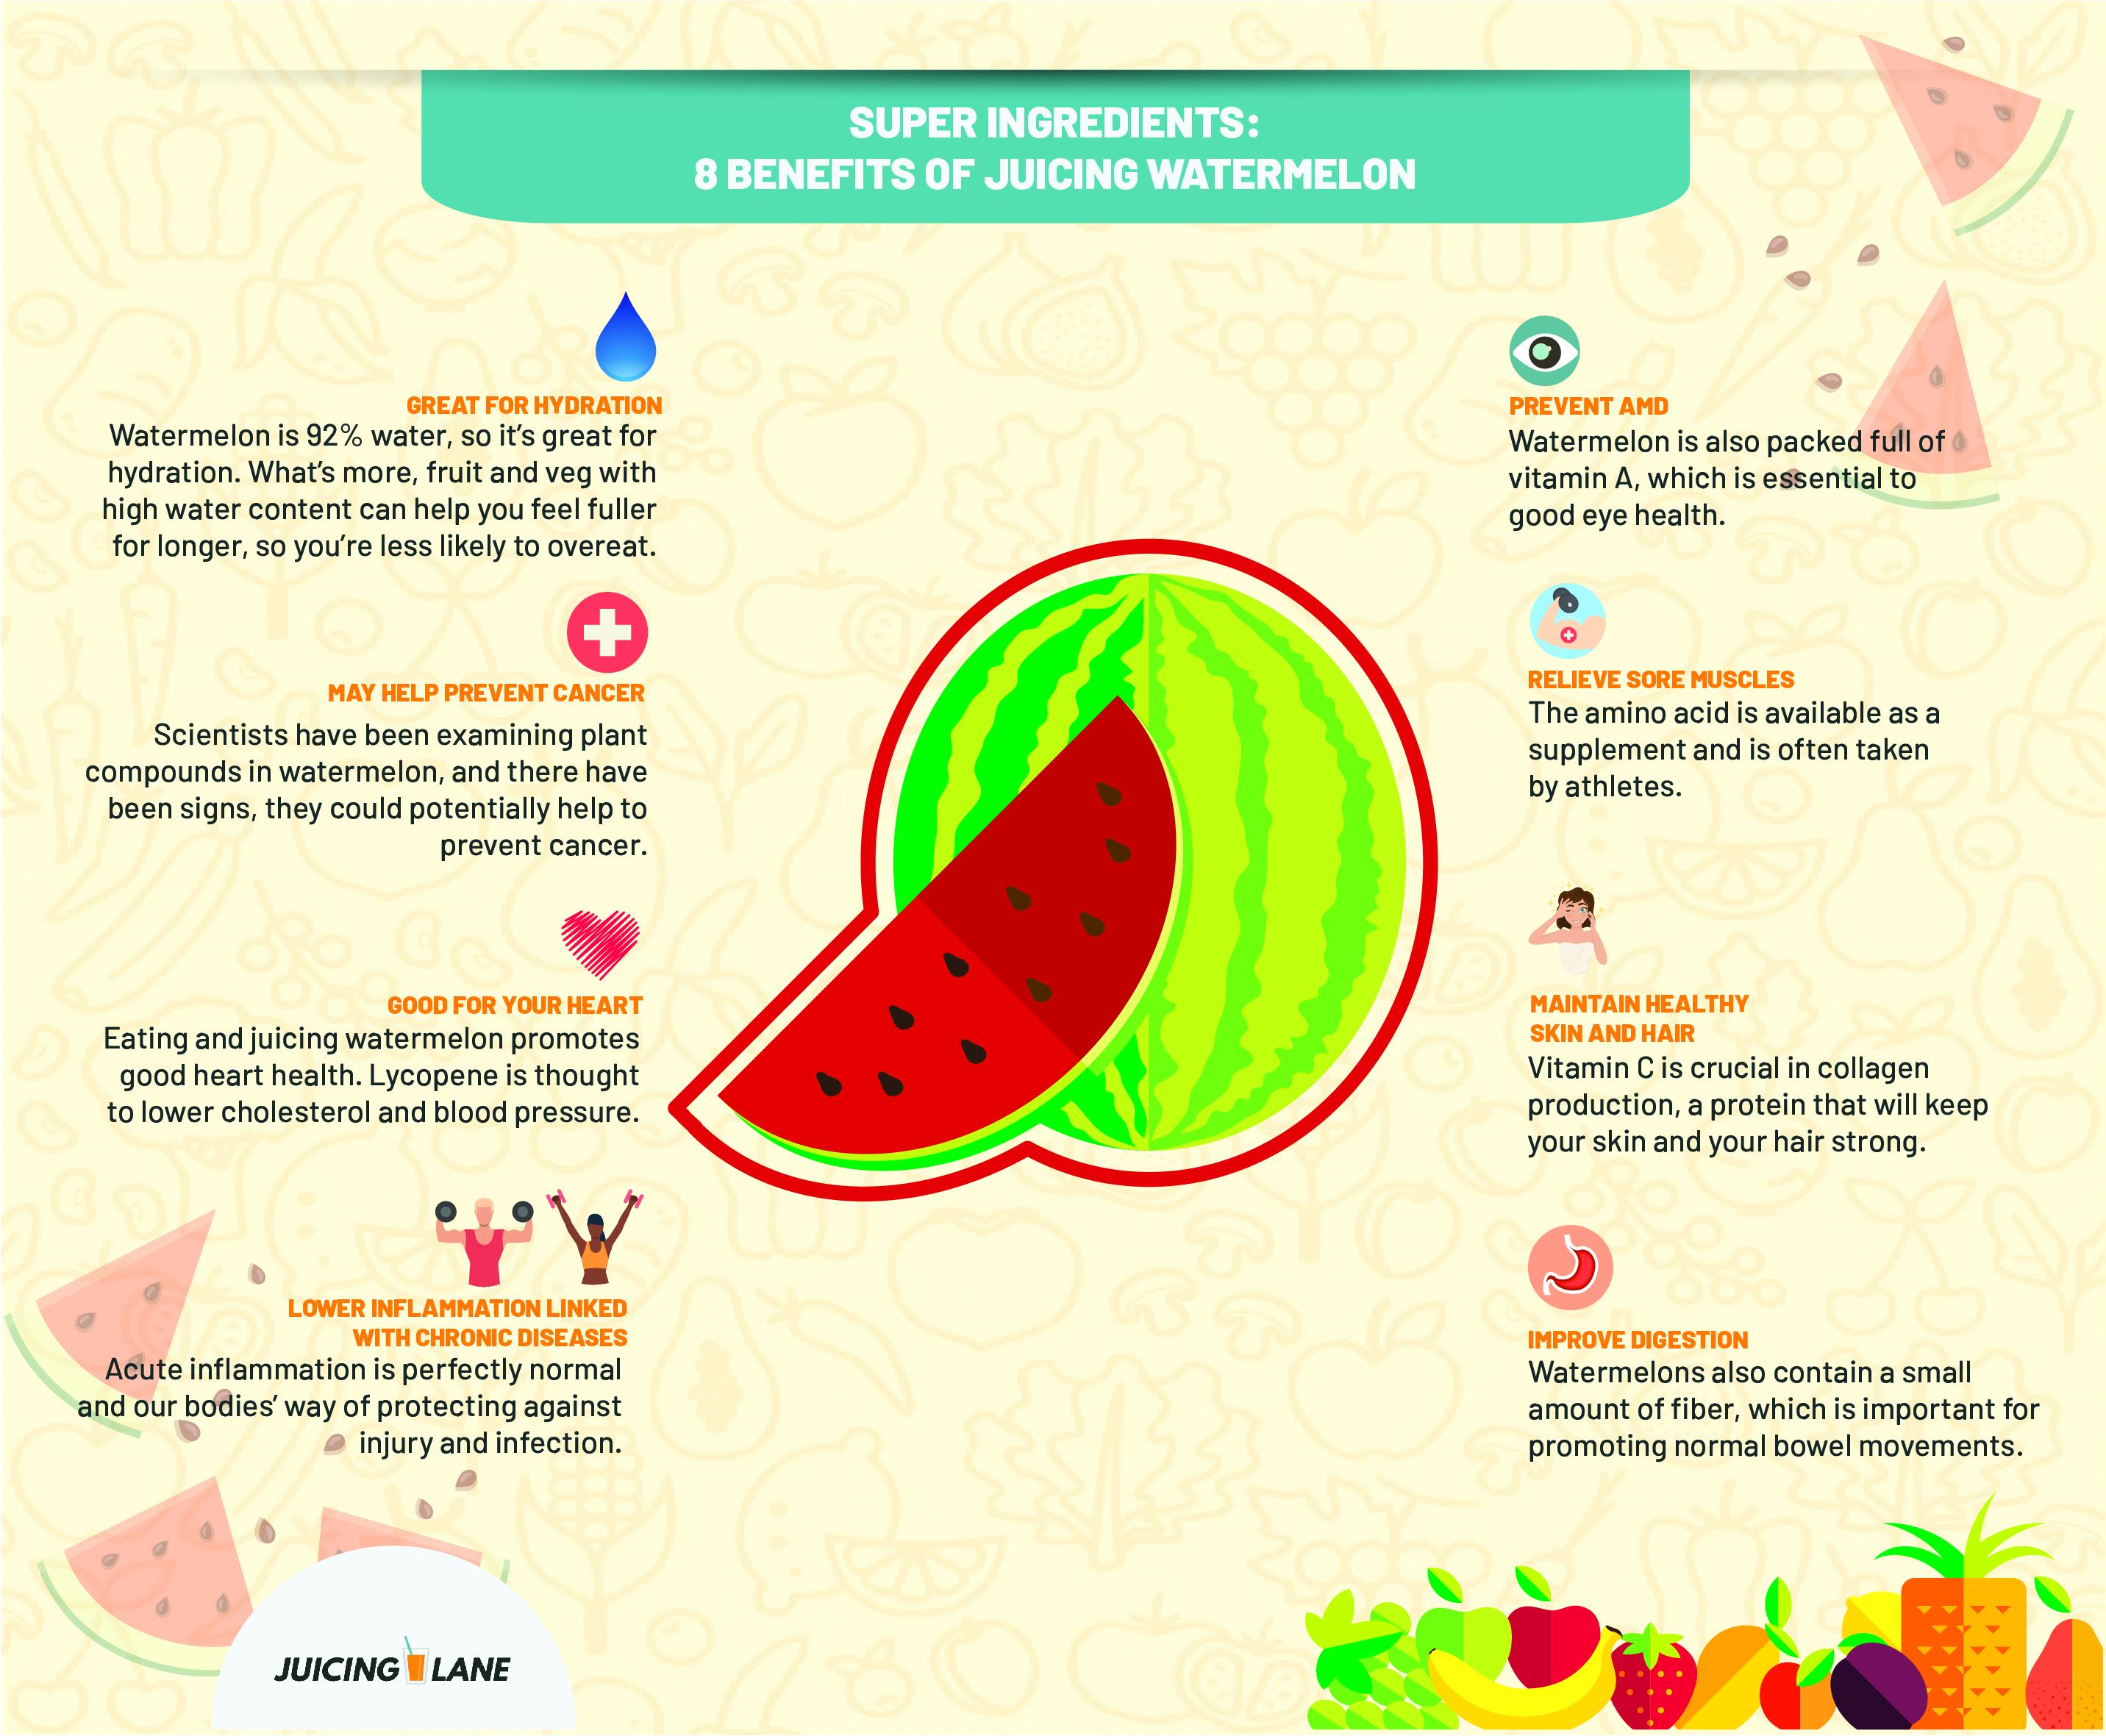 Super Ingredients: 8 Benefits Of Juicing Watermelon